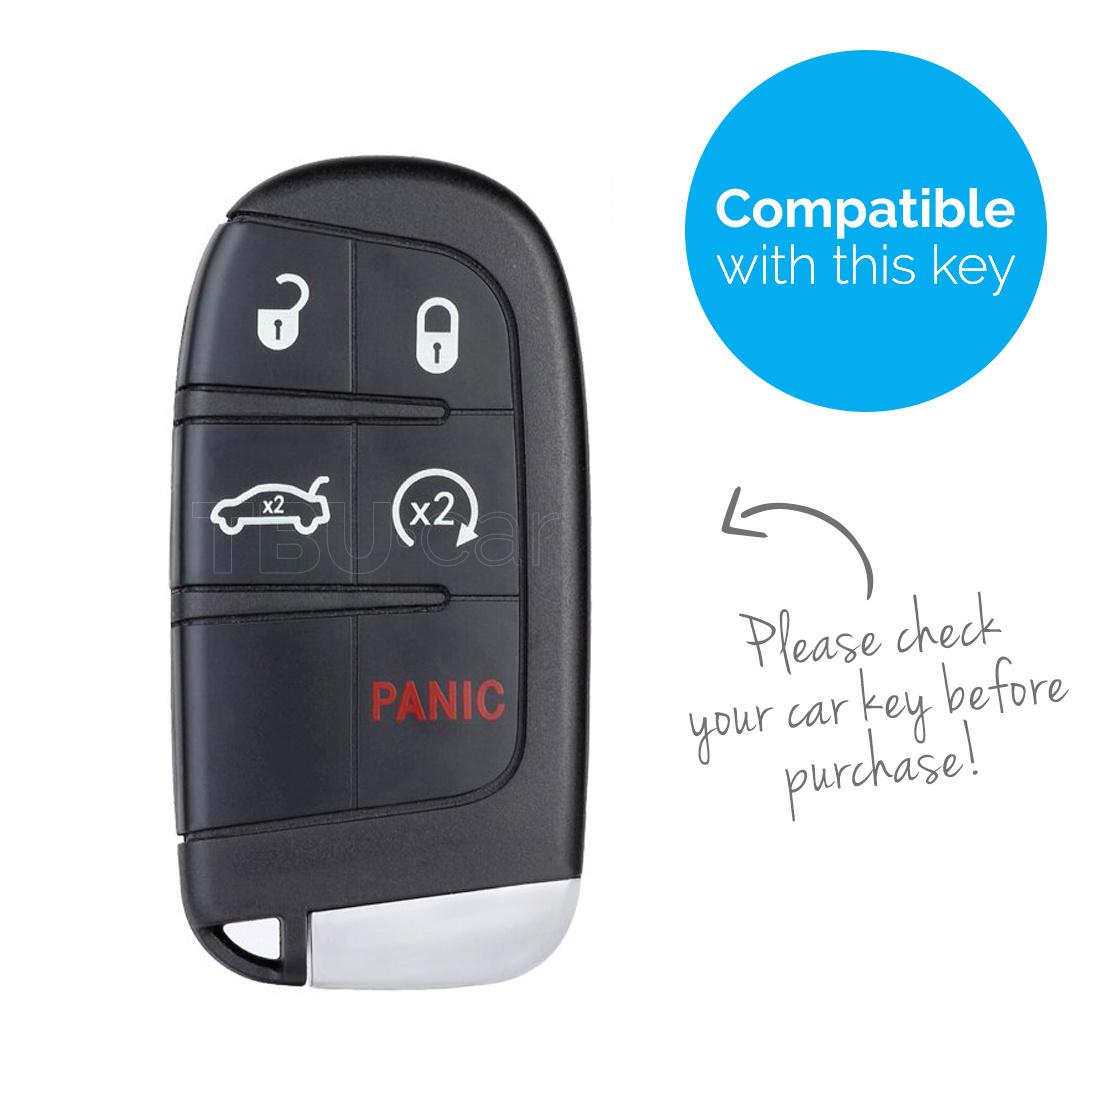 TBU car TBU car Autoschlüssel Hülle kompatibel mit Fiat 5 Tasten (Keyless Entry) - Schutzhülle aus Silikon - Auto Schlüsselhülle Cover in Weiß